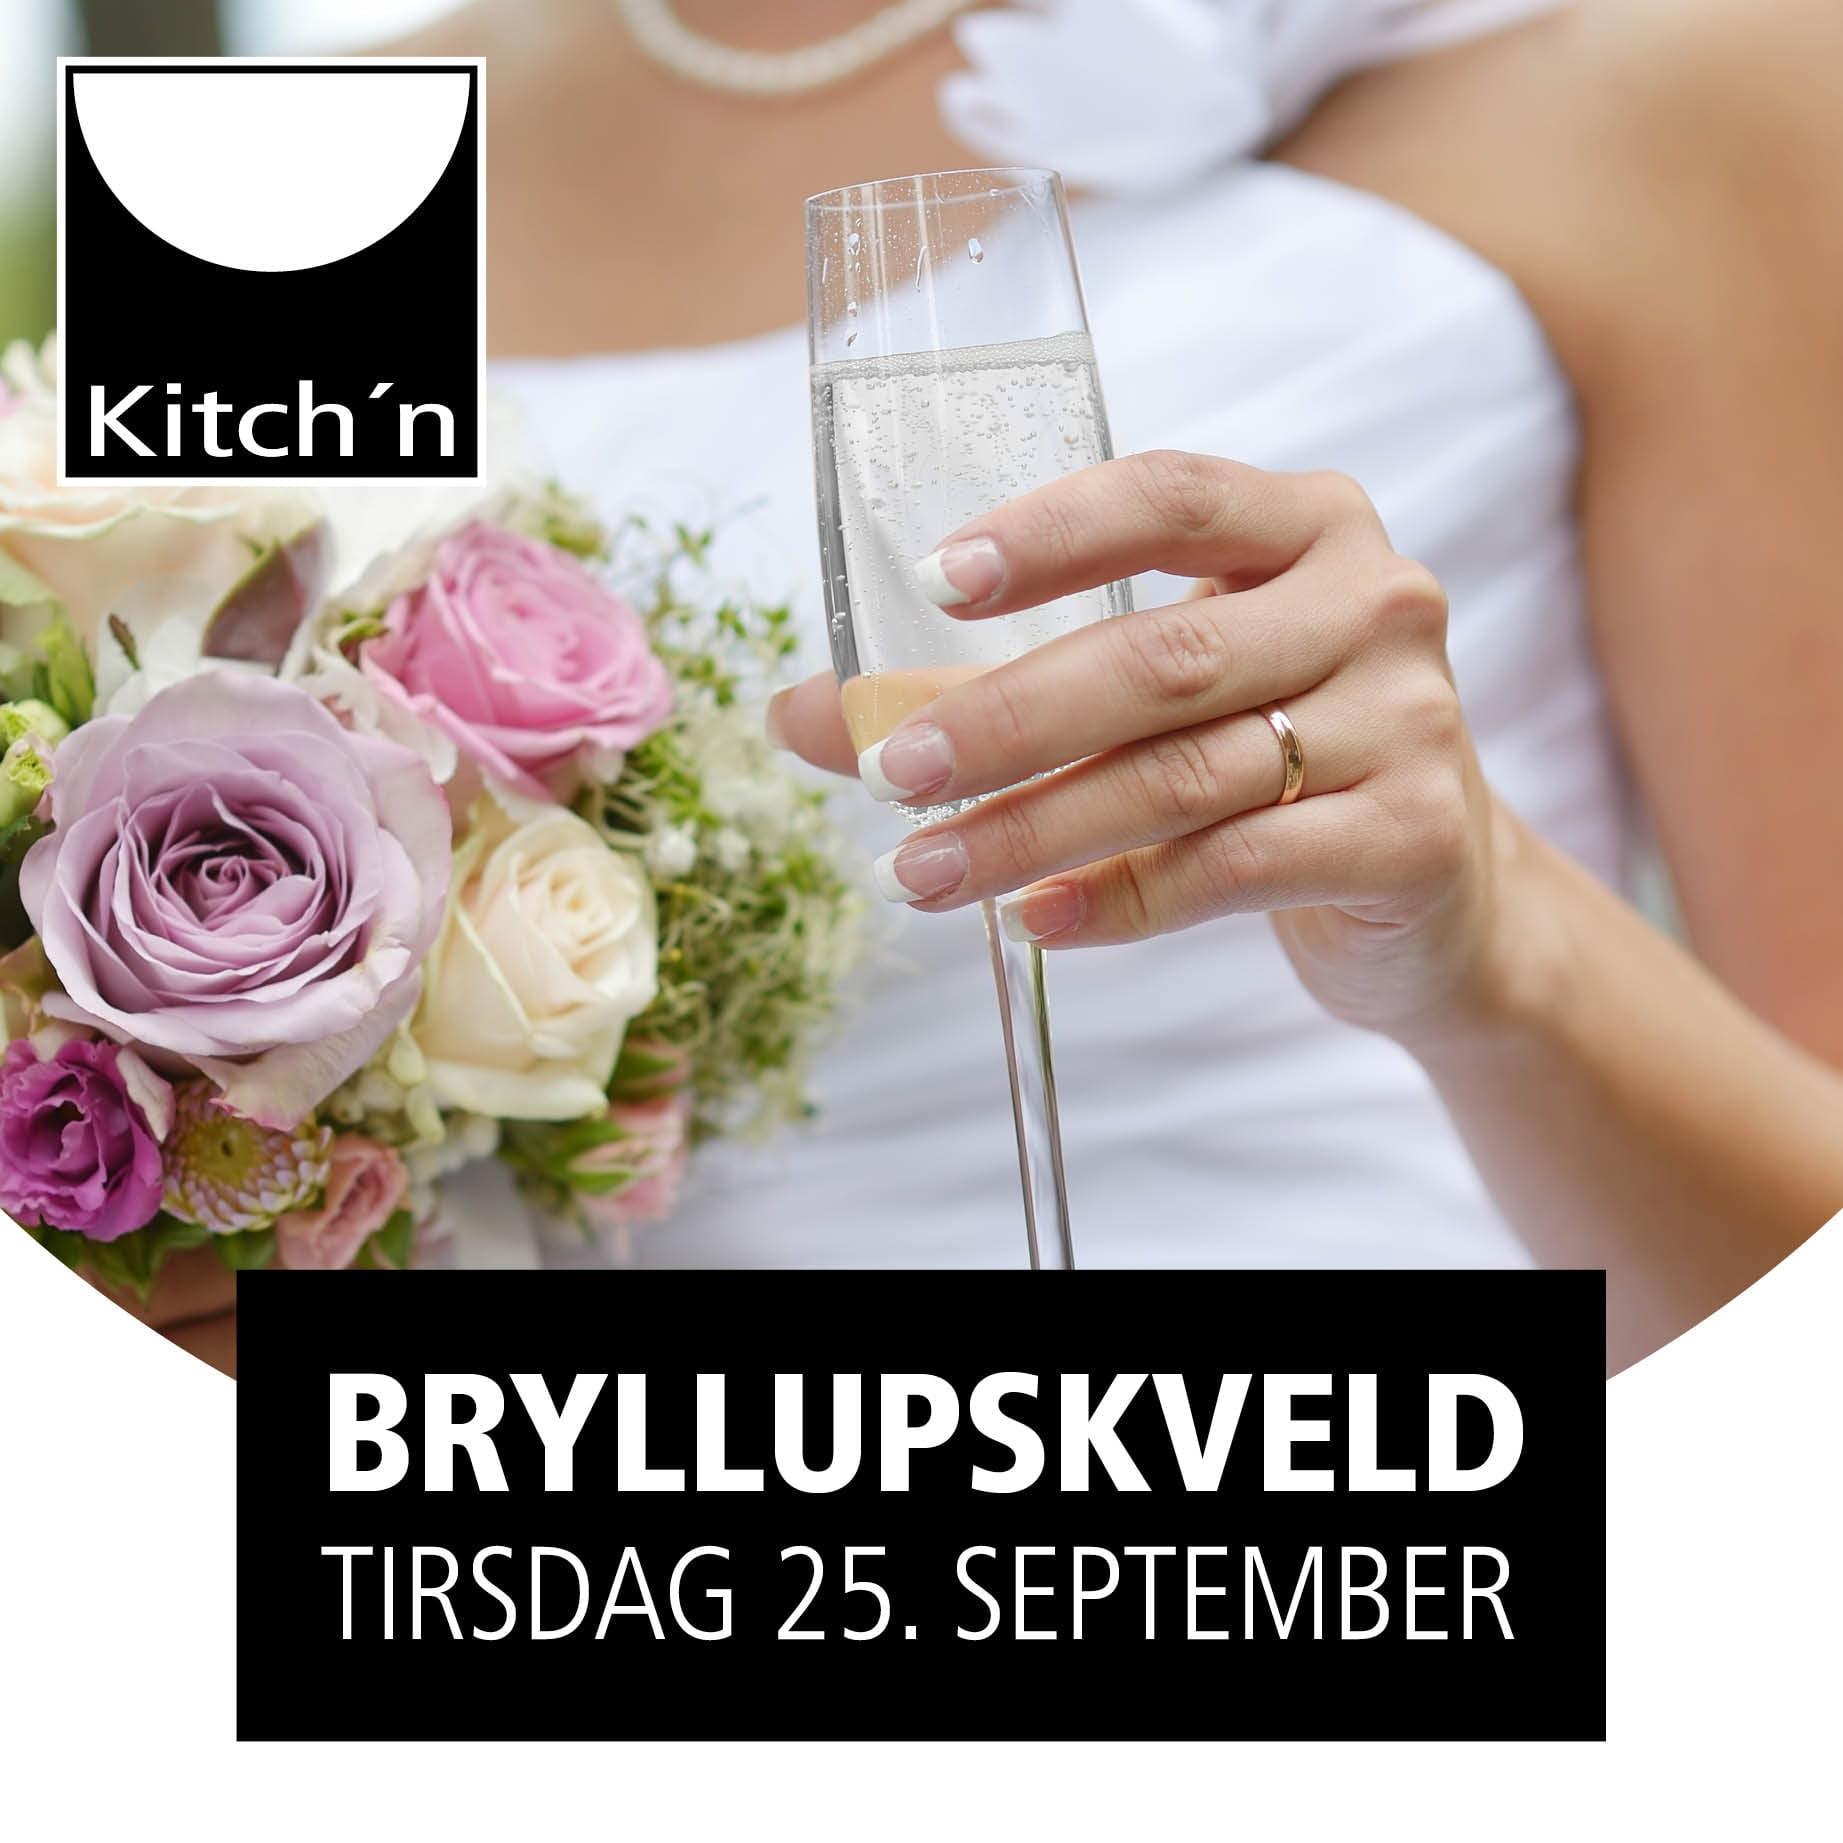 Bryllupskveld bryllupsmesse kitch´n